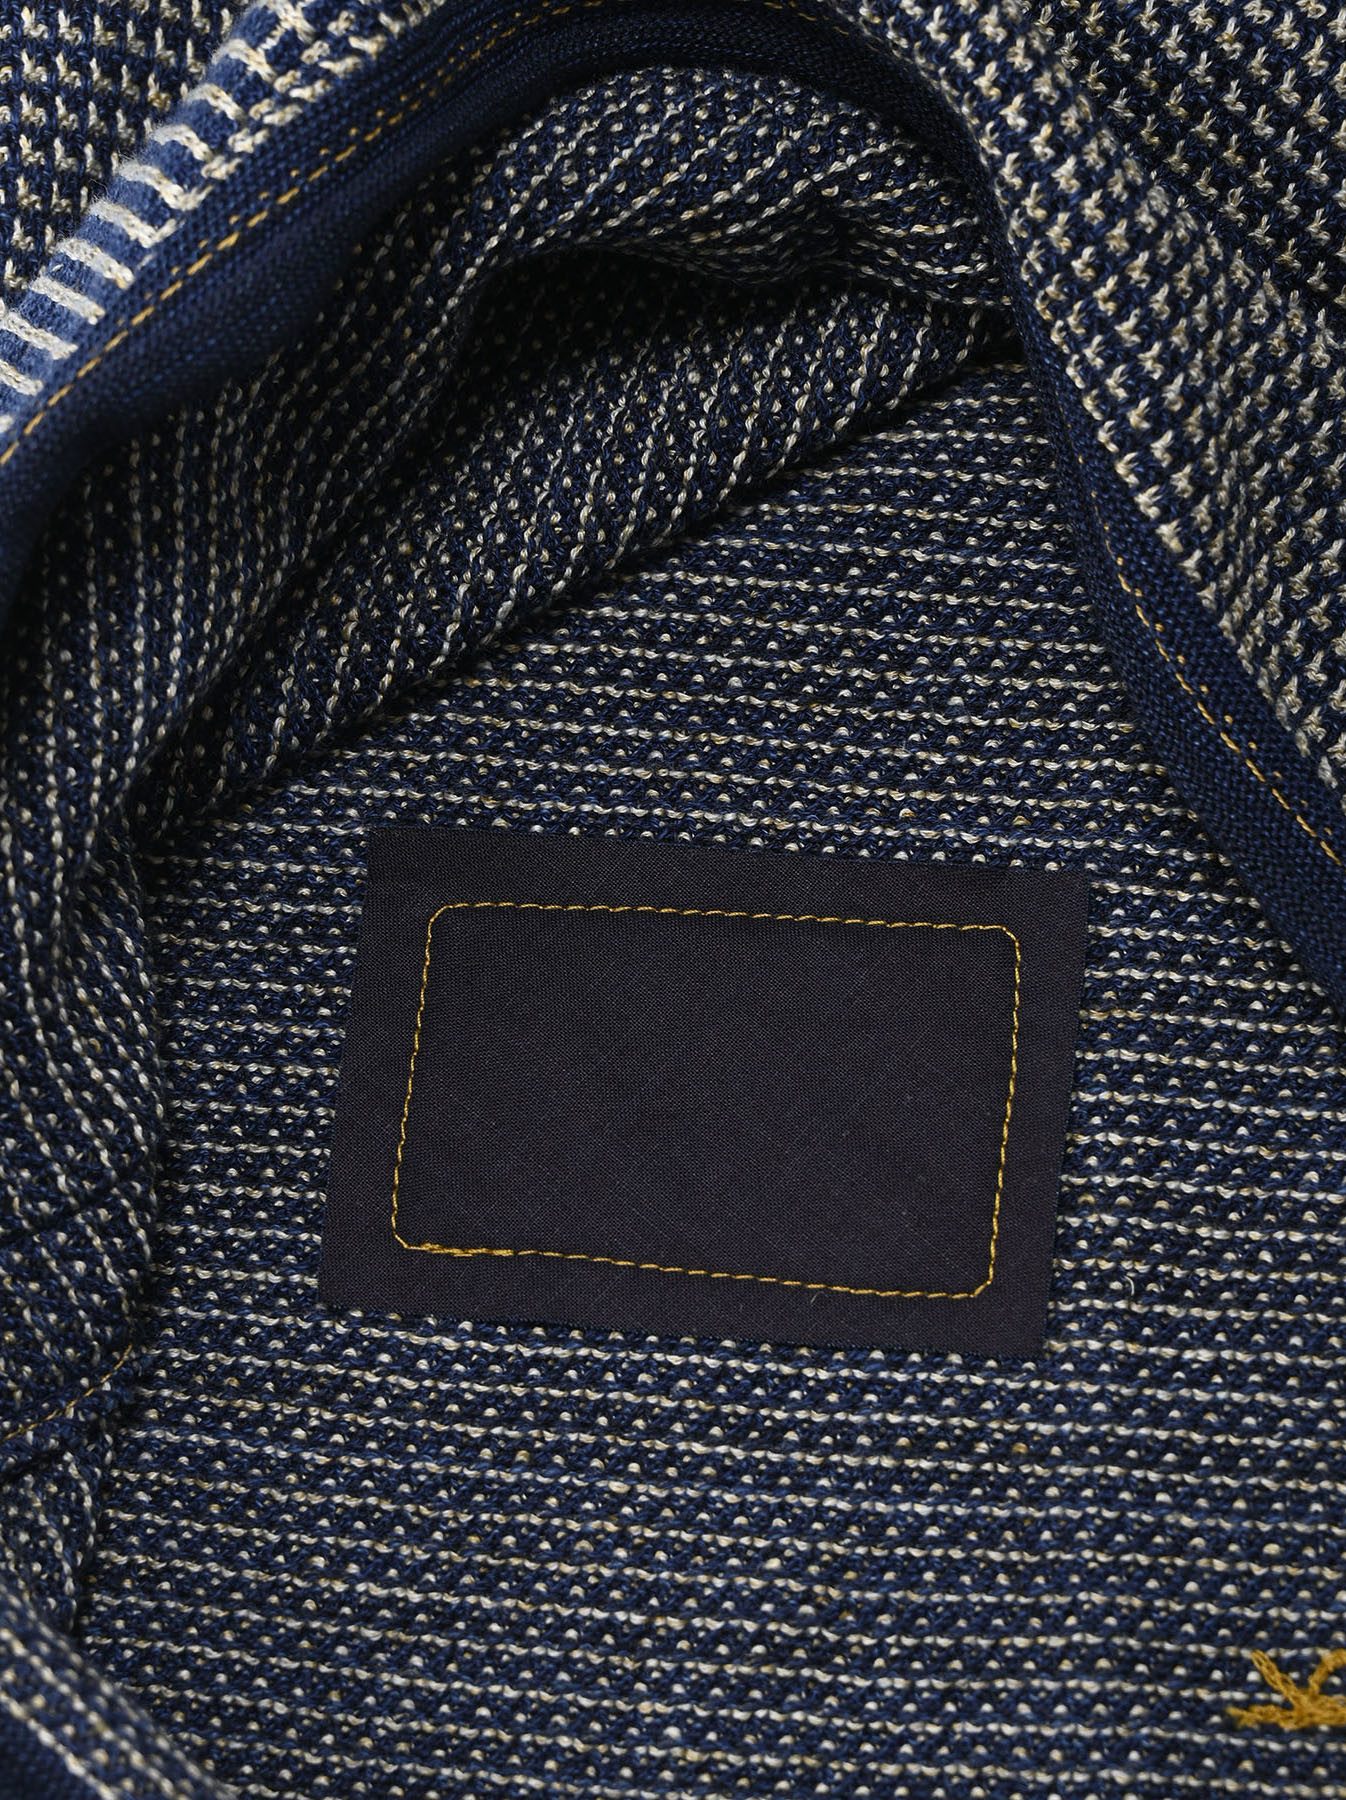 Indigo Tappet Kanoko Umahiko Sweater-12